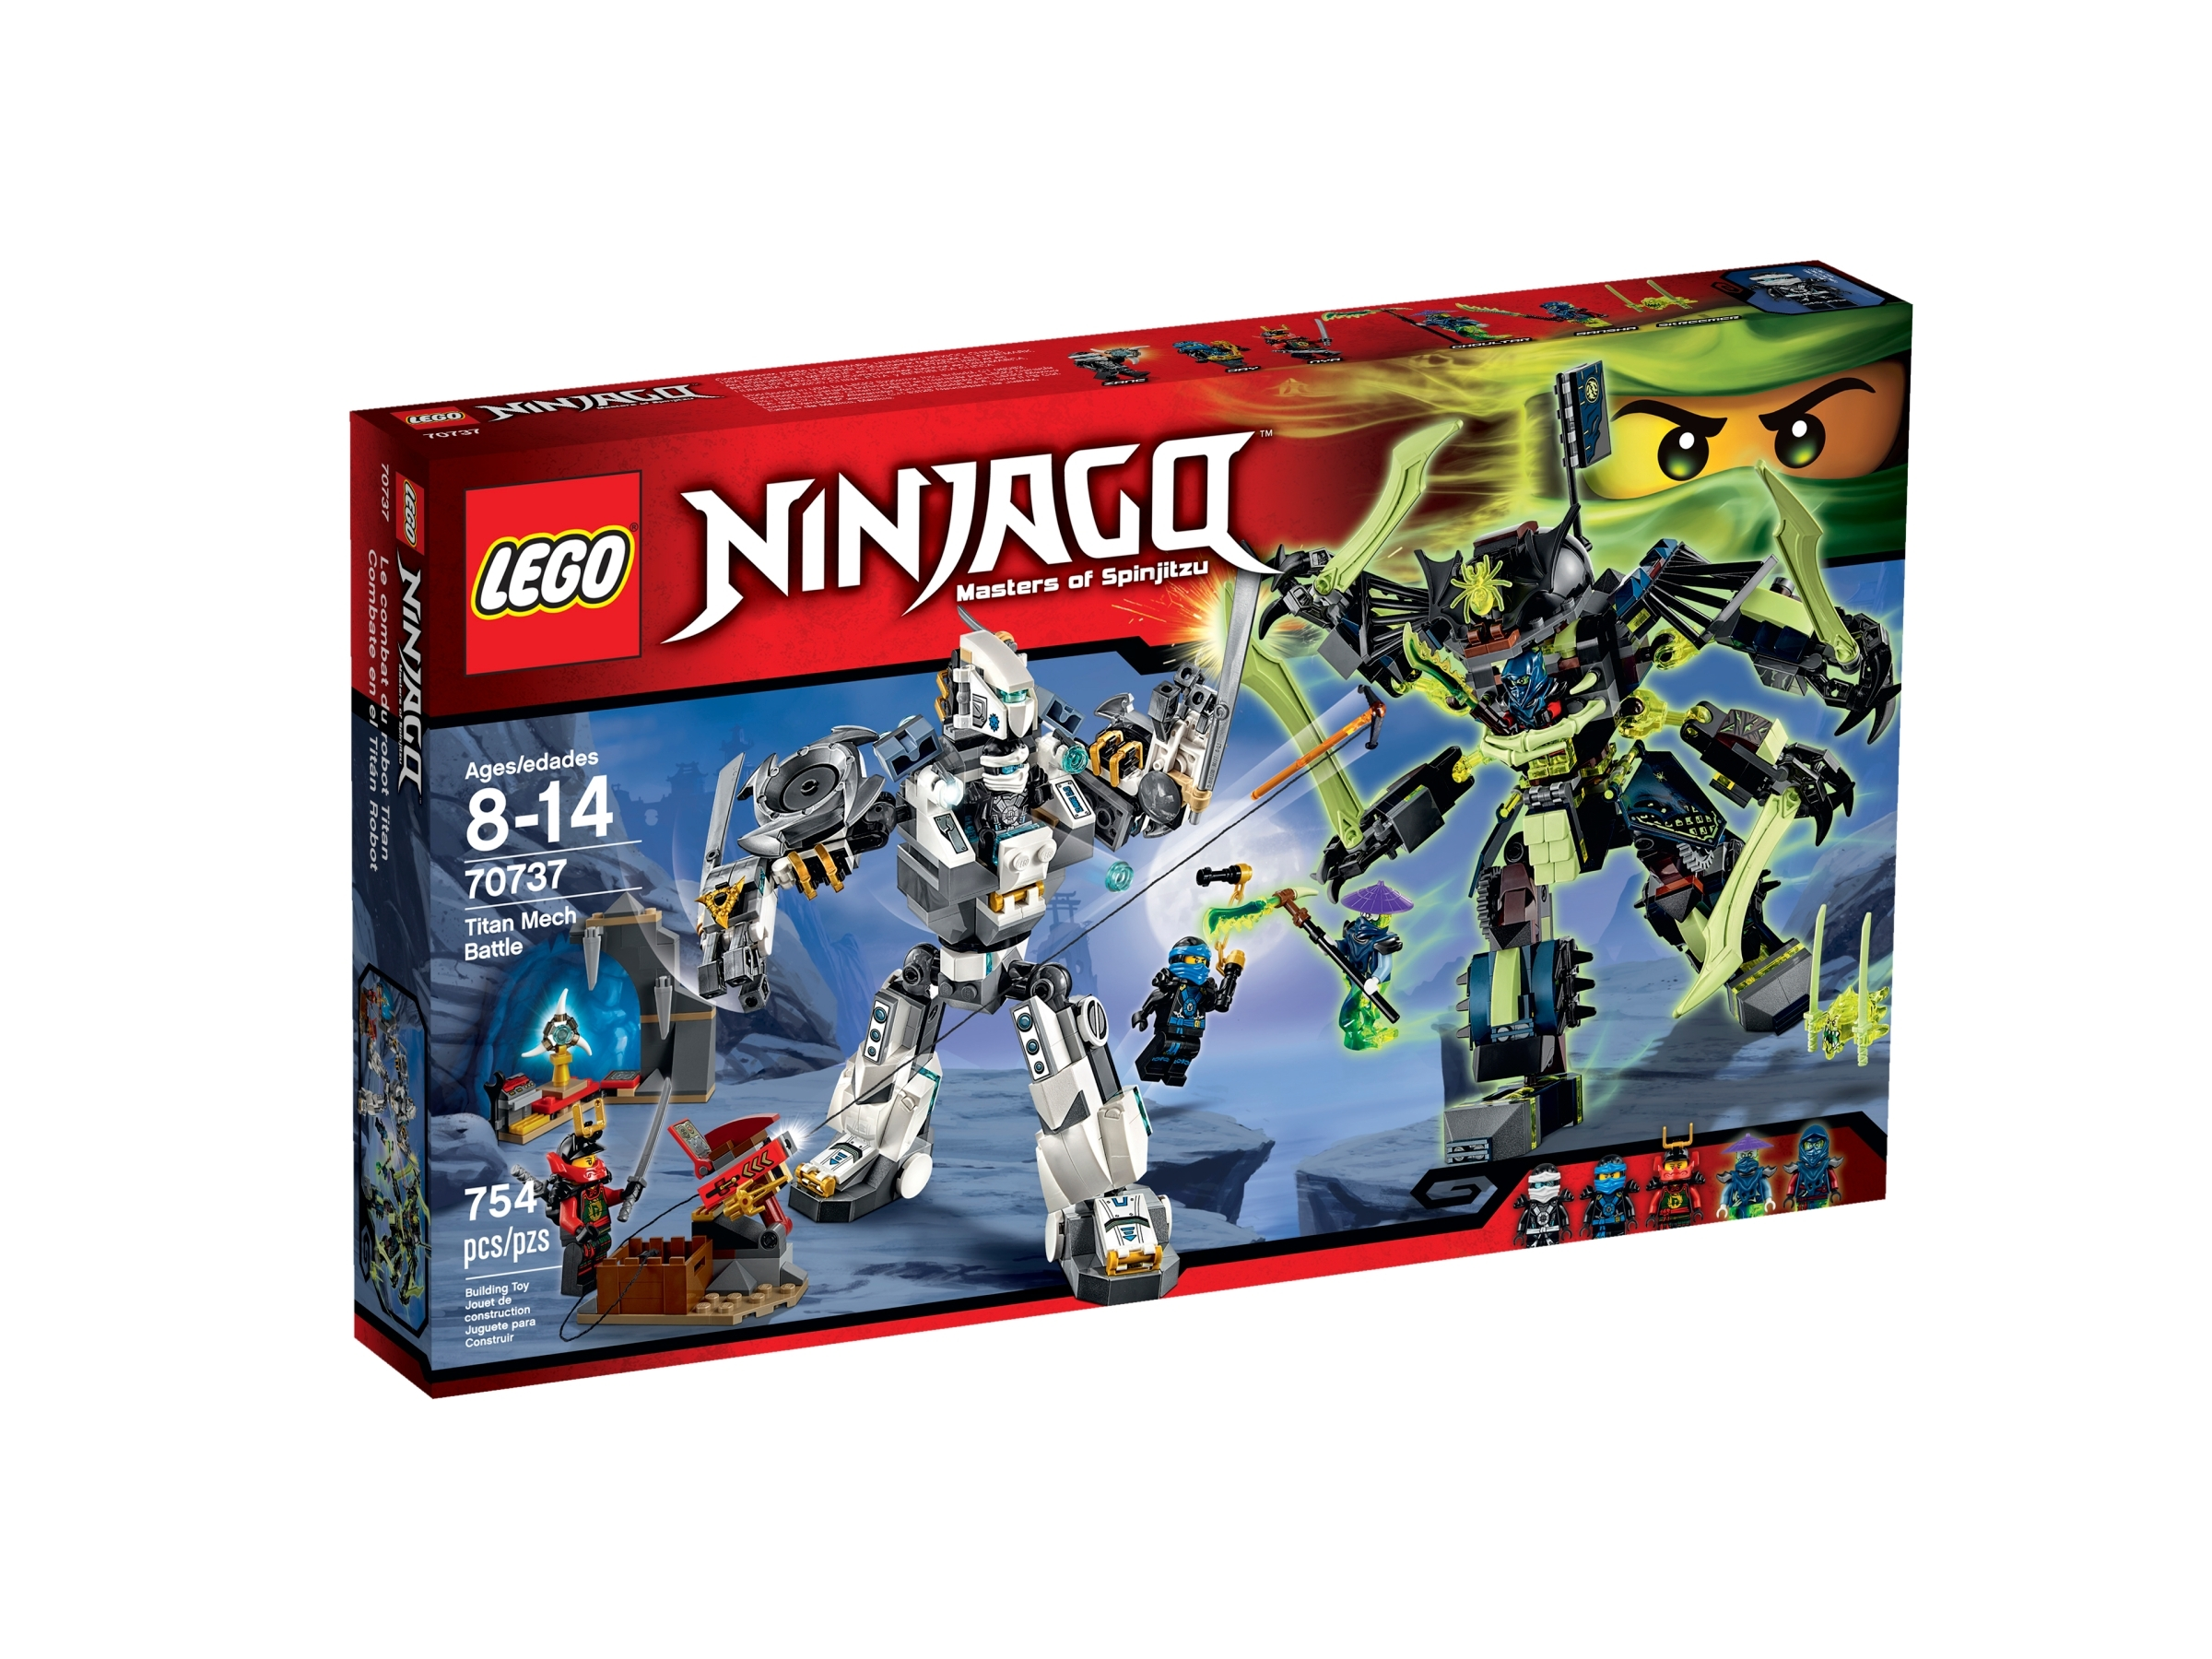 NEW LEGO JAY MINIFIG from Titan Mech Battle 70737 minifigure figure blue ninja